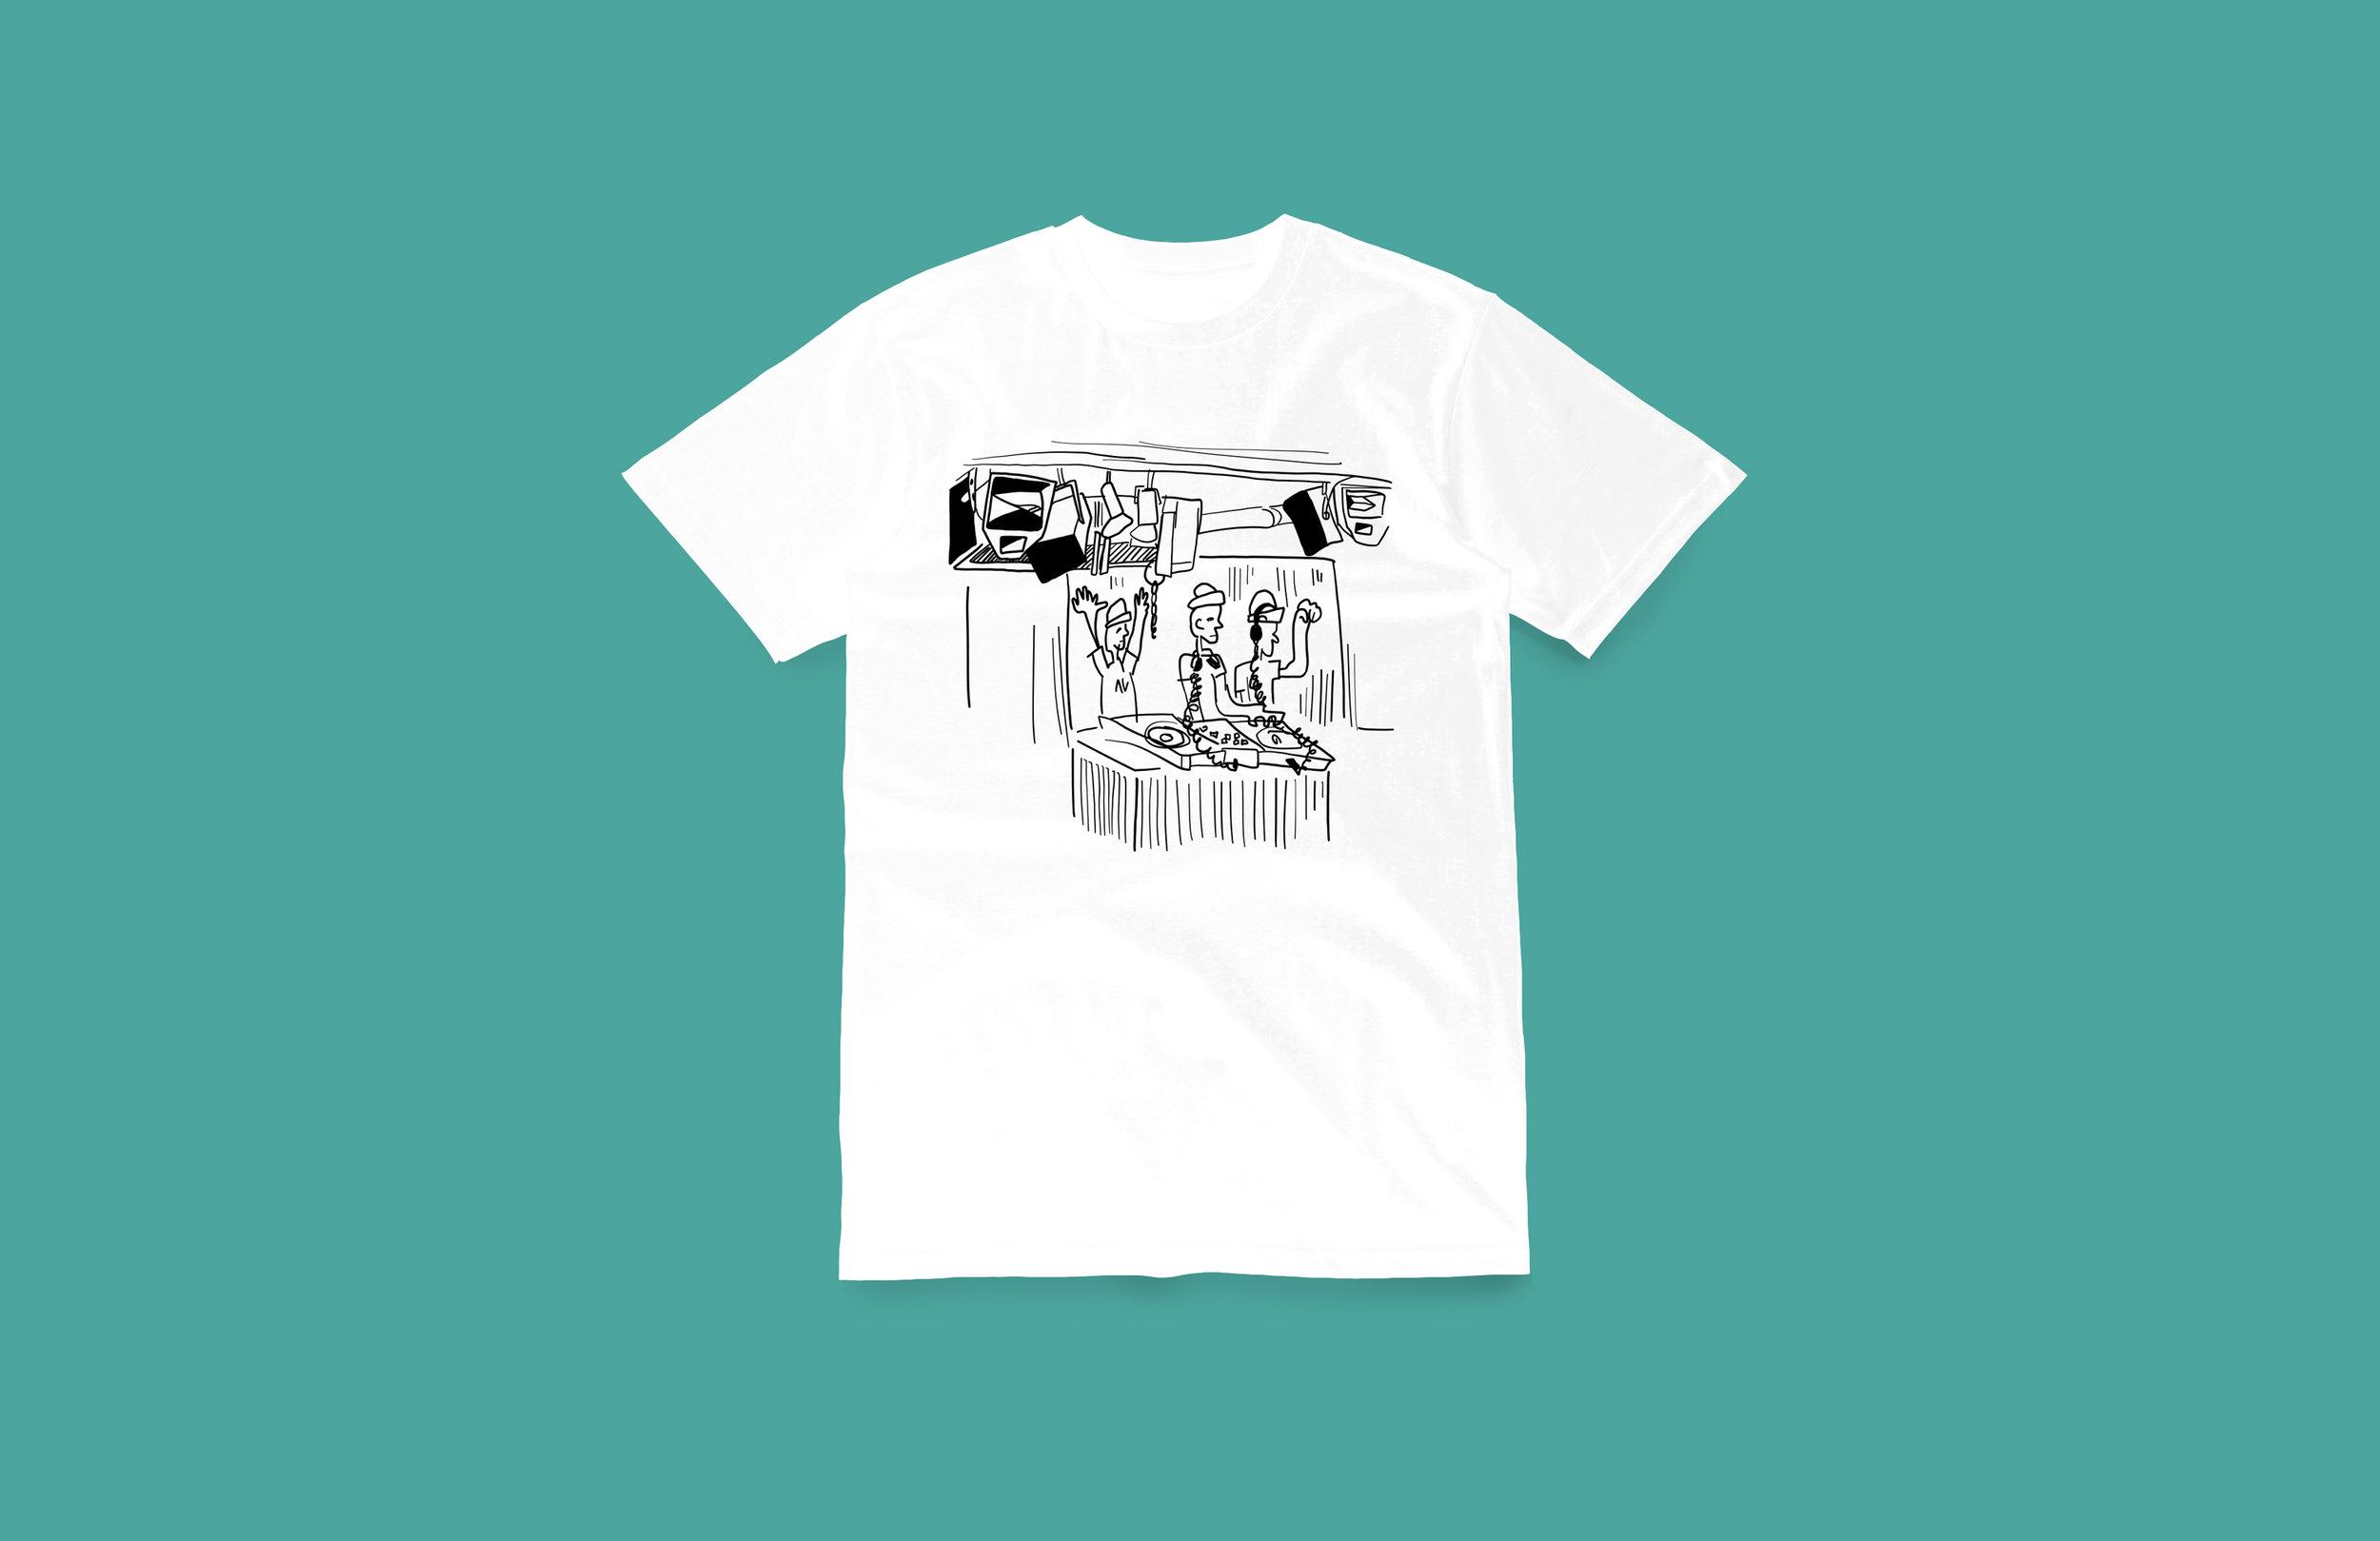 MockUp_Shirts_Prince-Charles.jpg